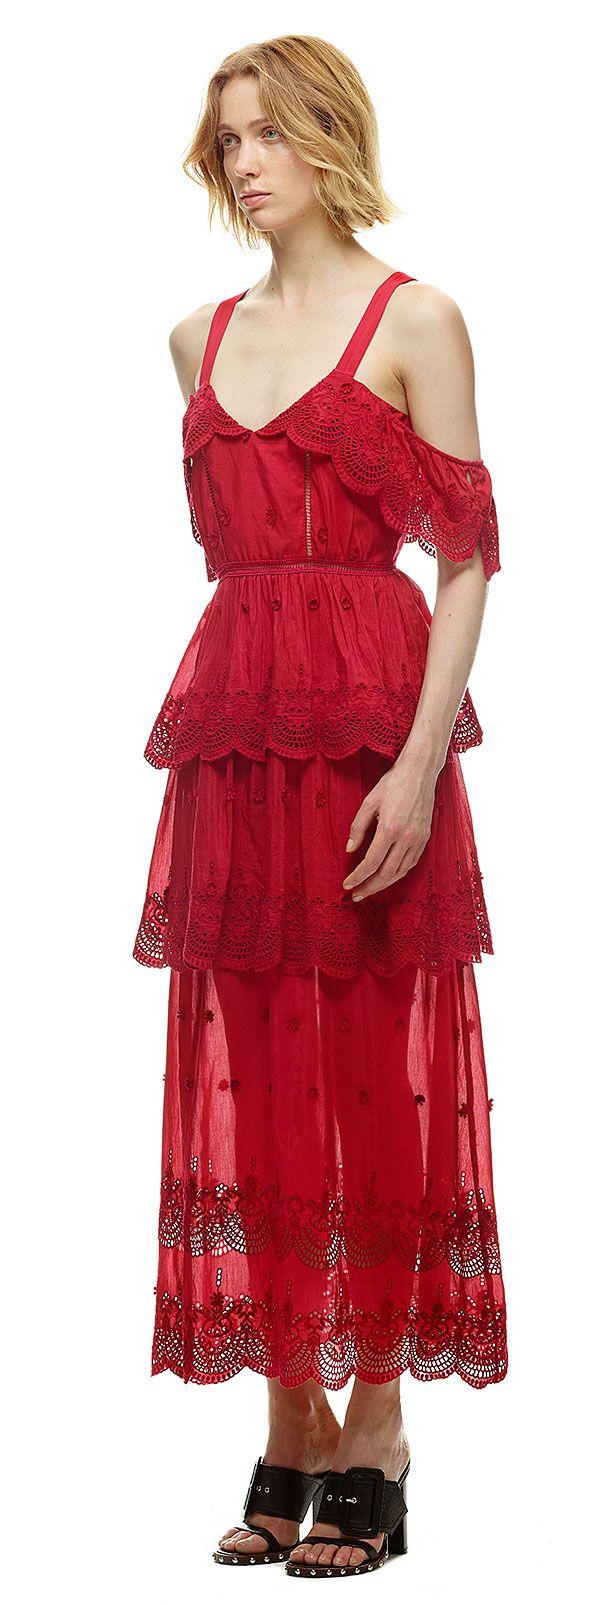 cb36c2f1bcf3 Raspberry Red Off-Shoulder Dress